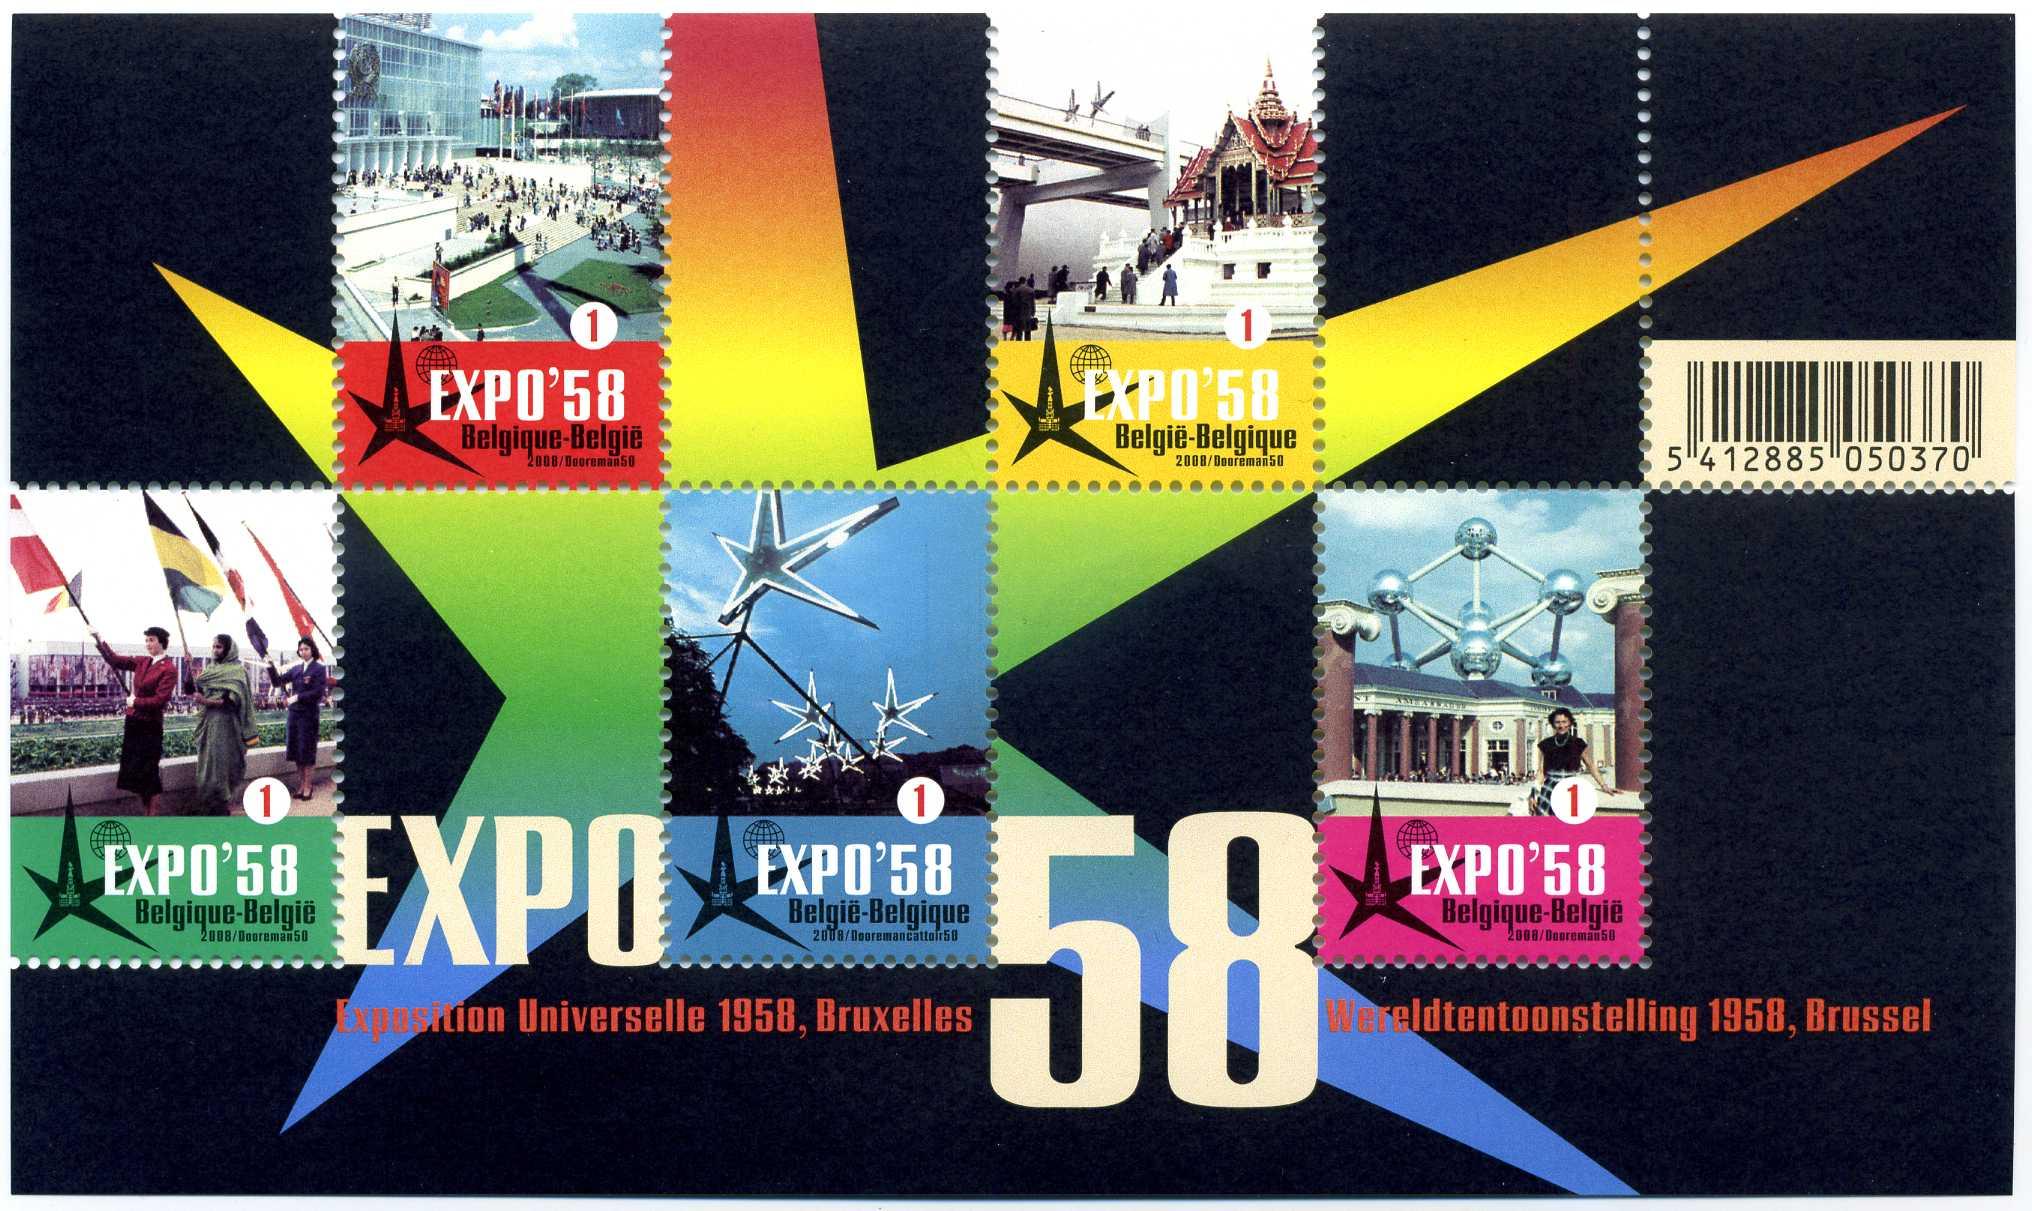 BE 018 2008 Expo 1958 Atomium.jpg